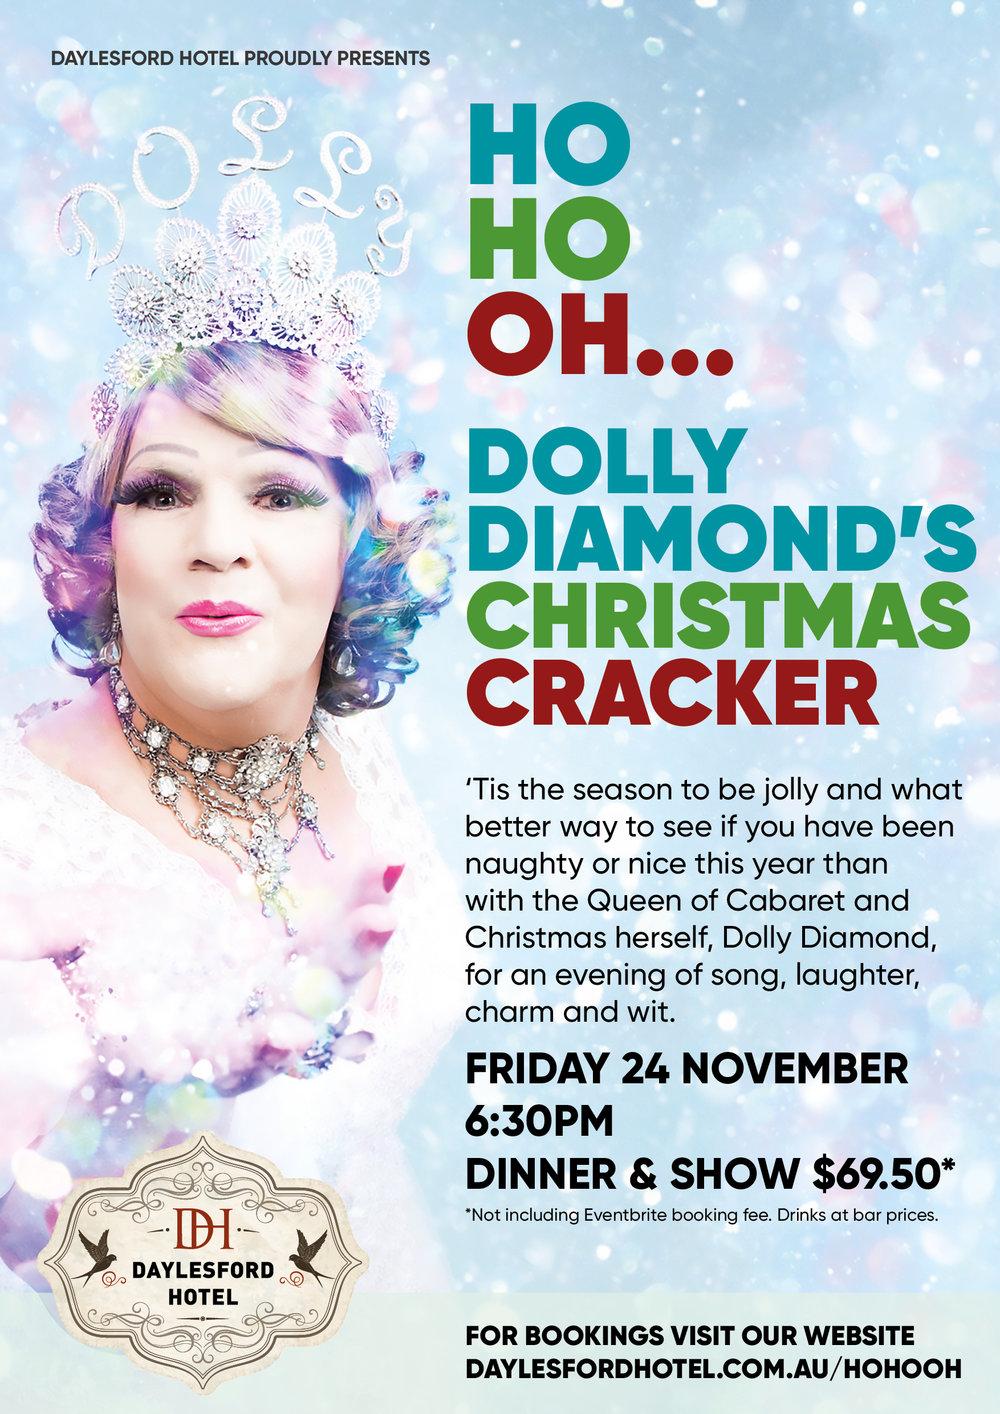 Dolly Diamonds Christmas Cracker at Daylesford Hotel